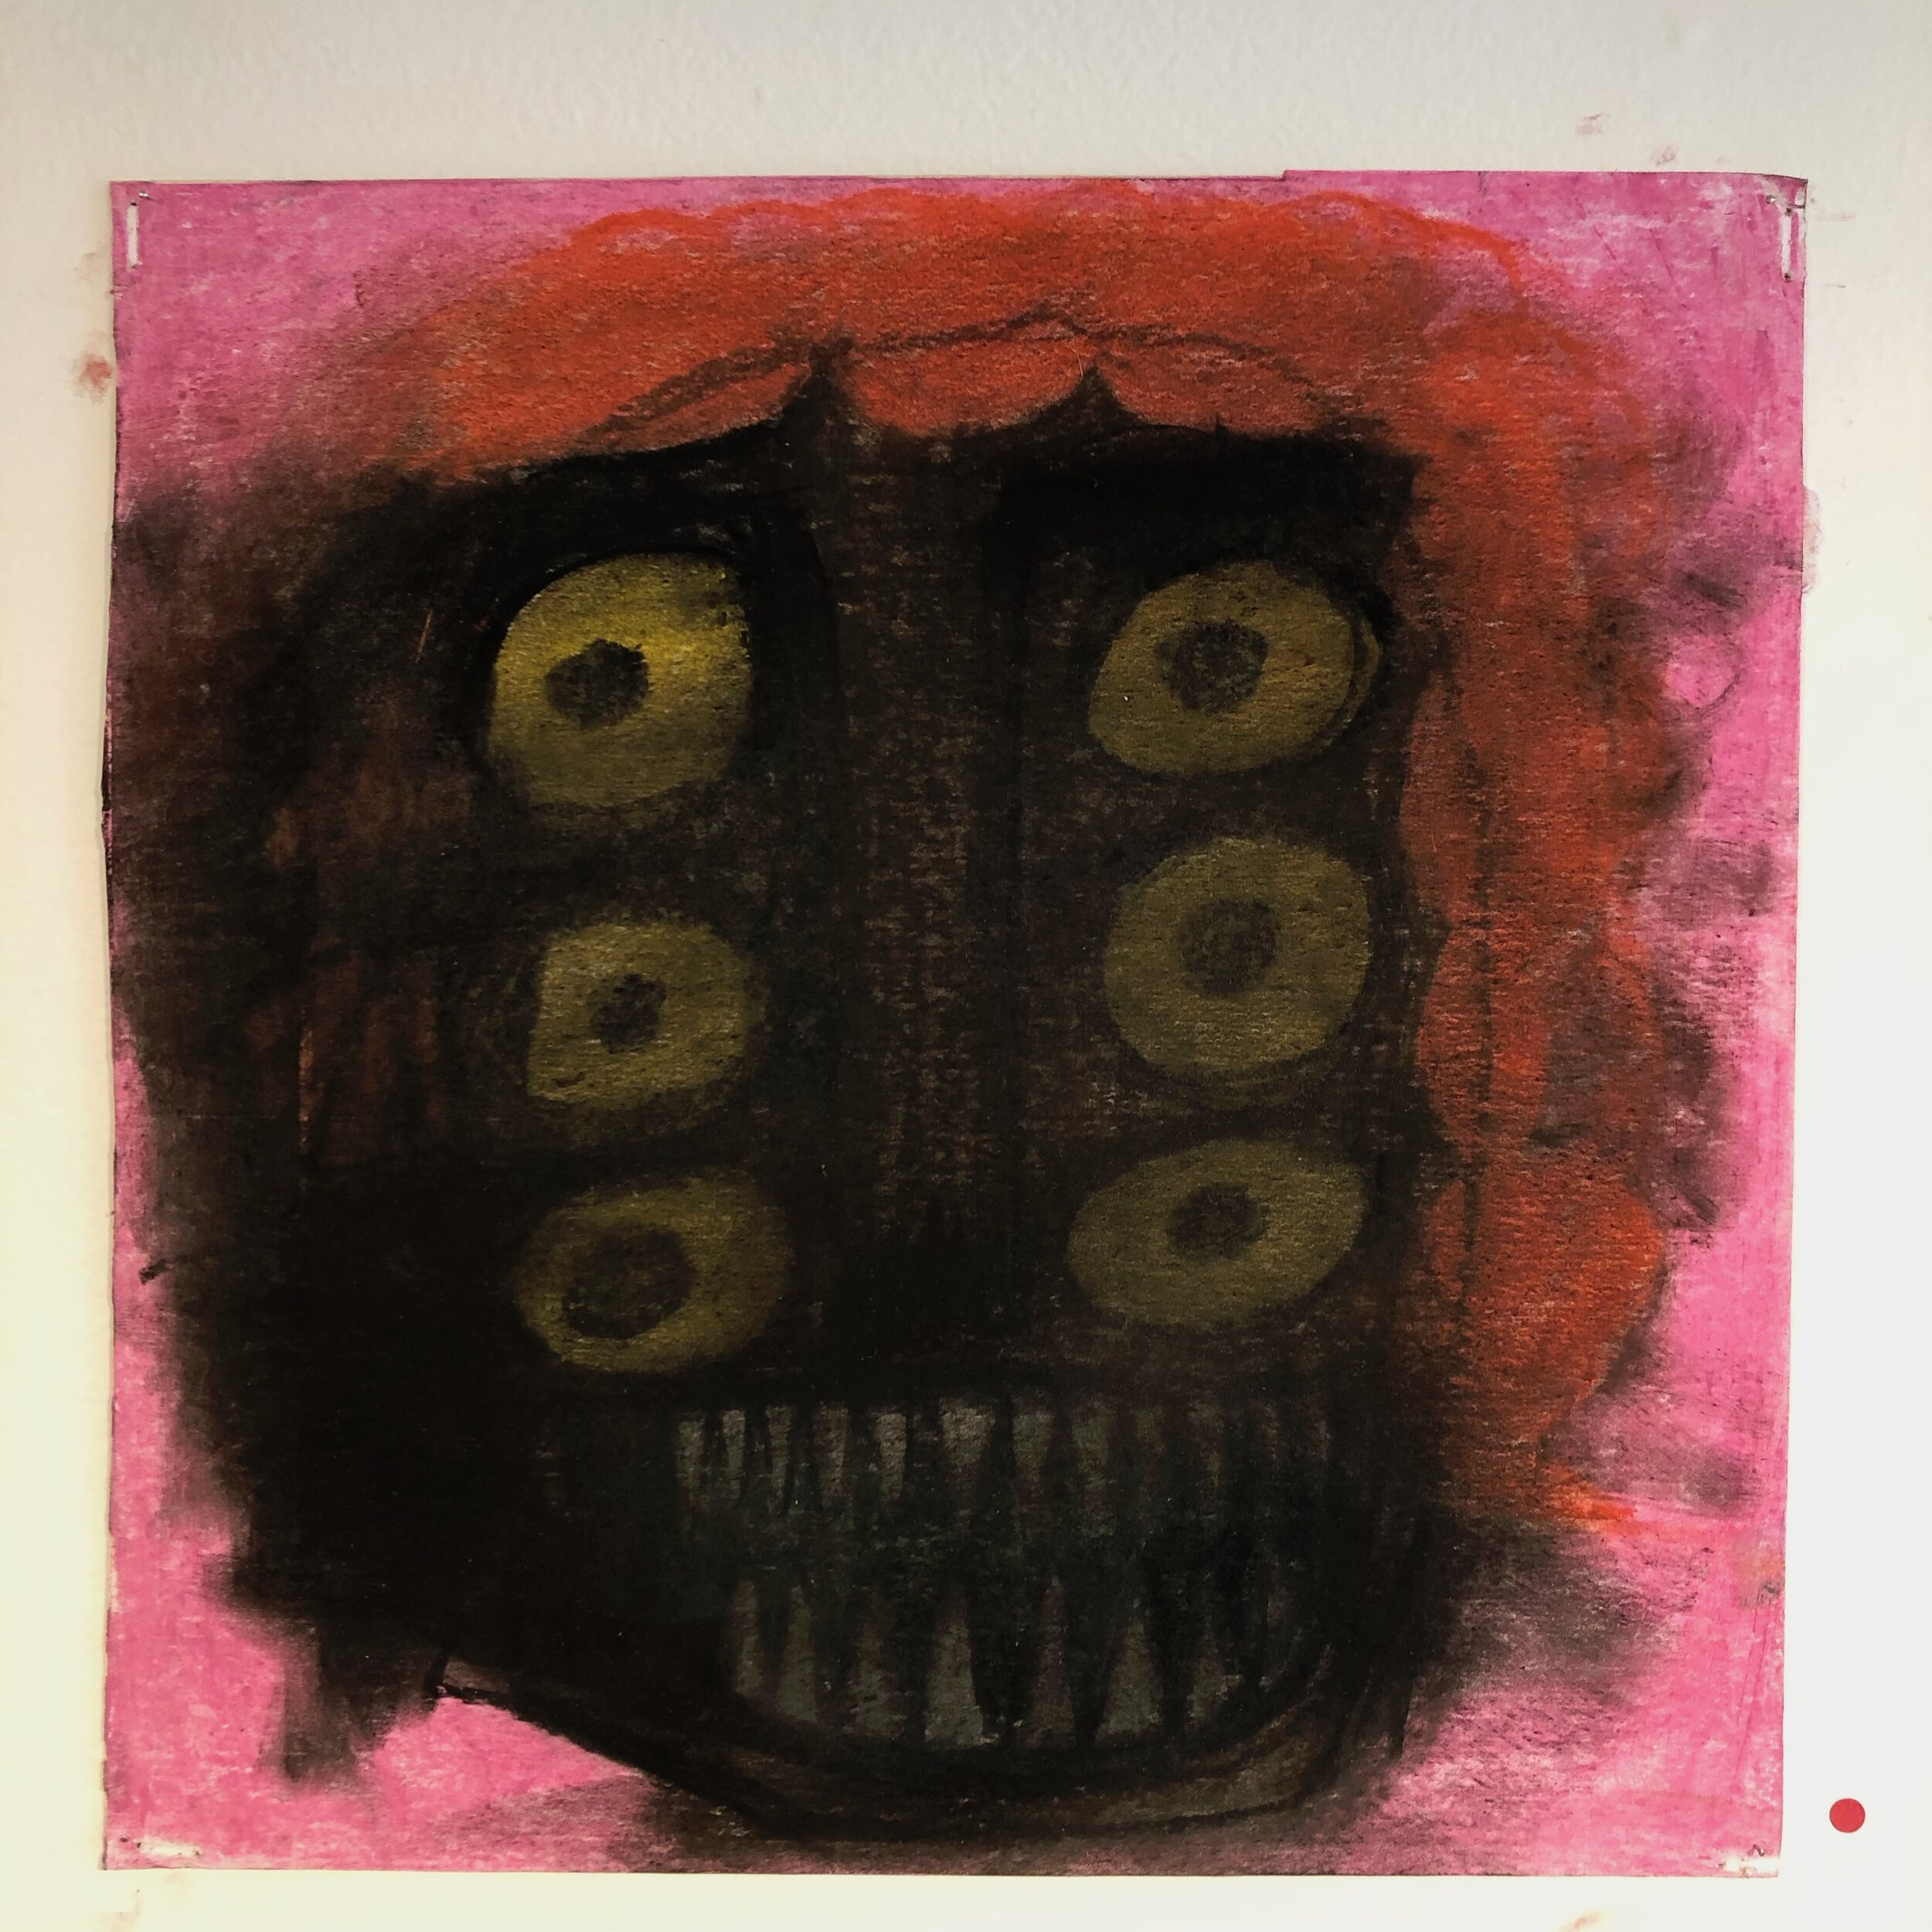 Untitled, oil pastel on cardboard, 12x12 in.